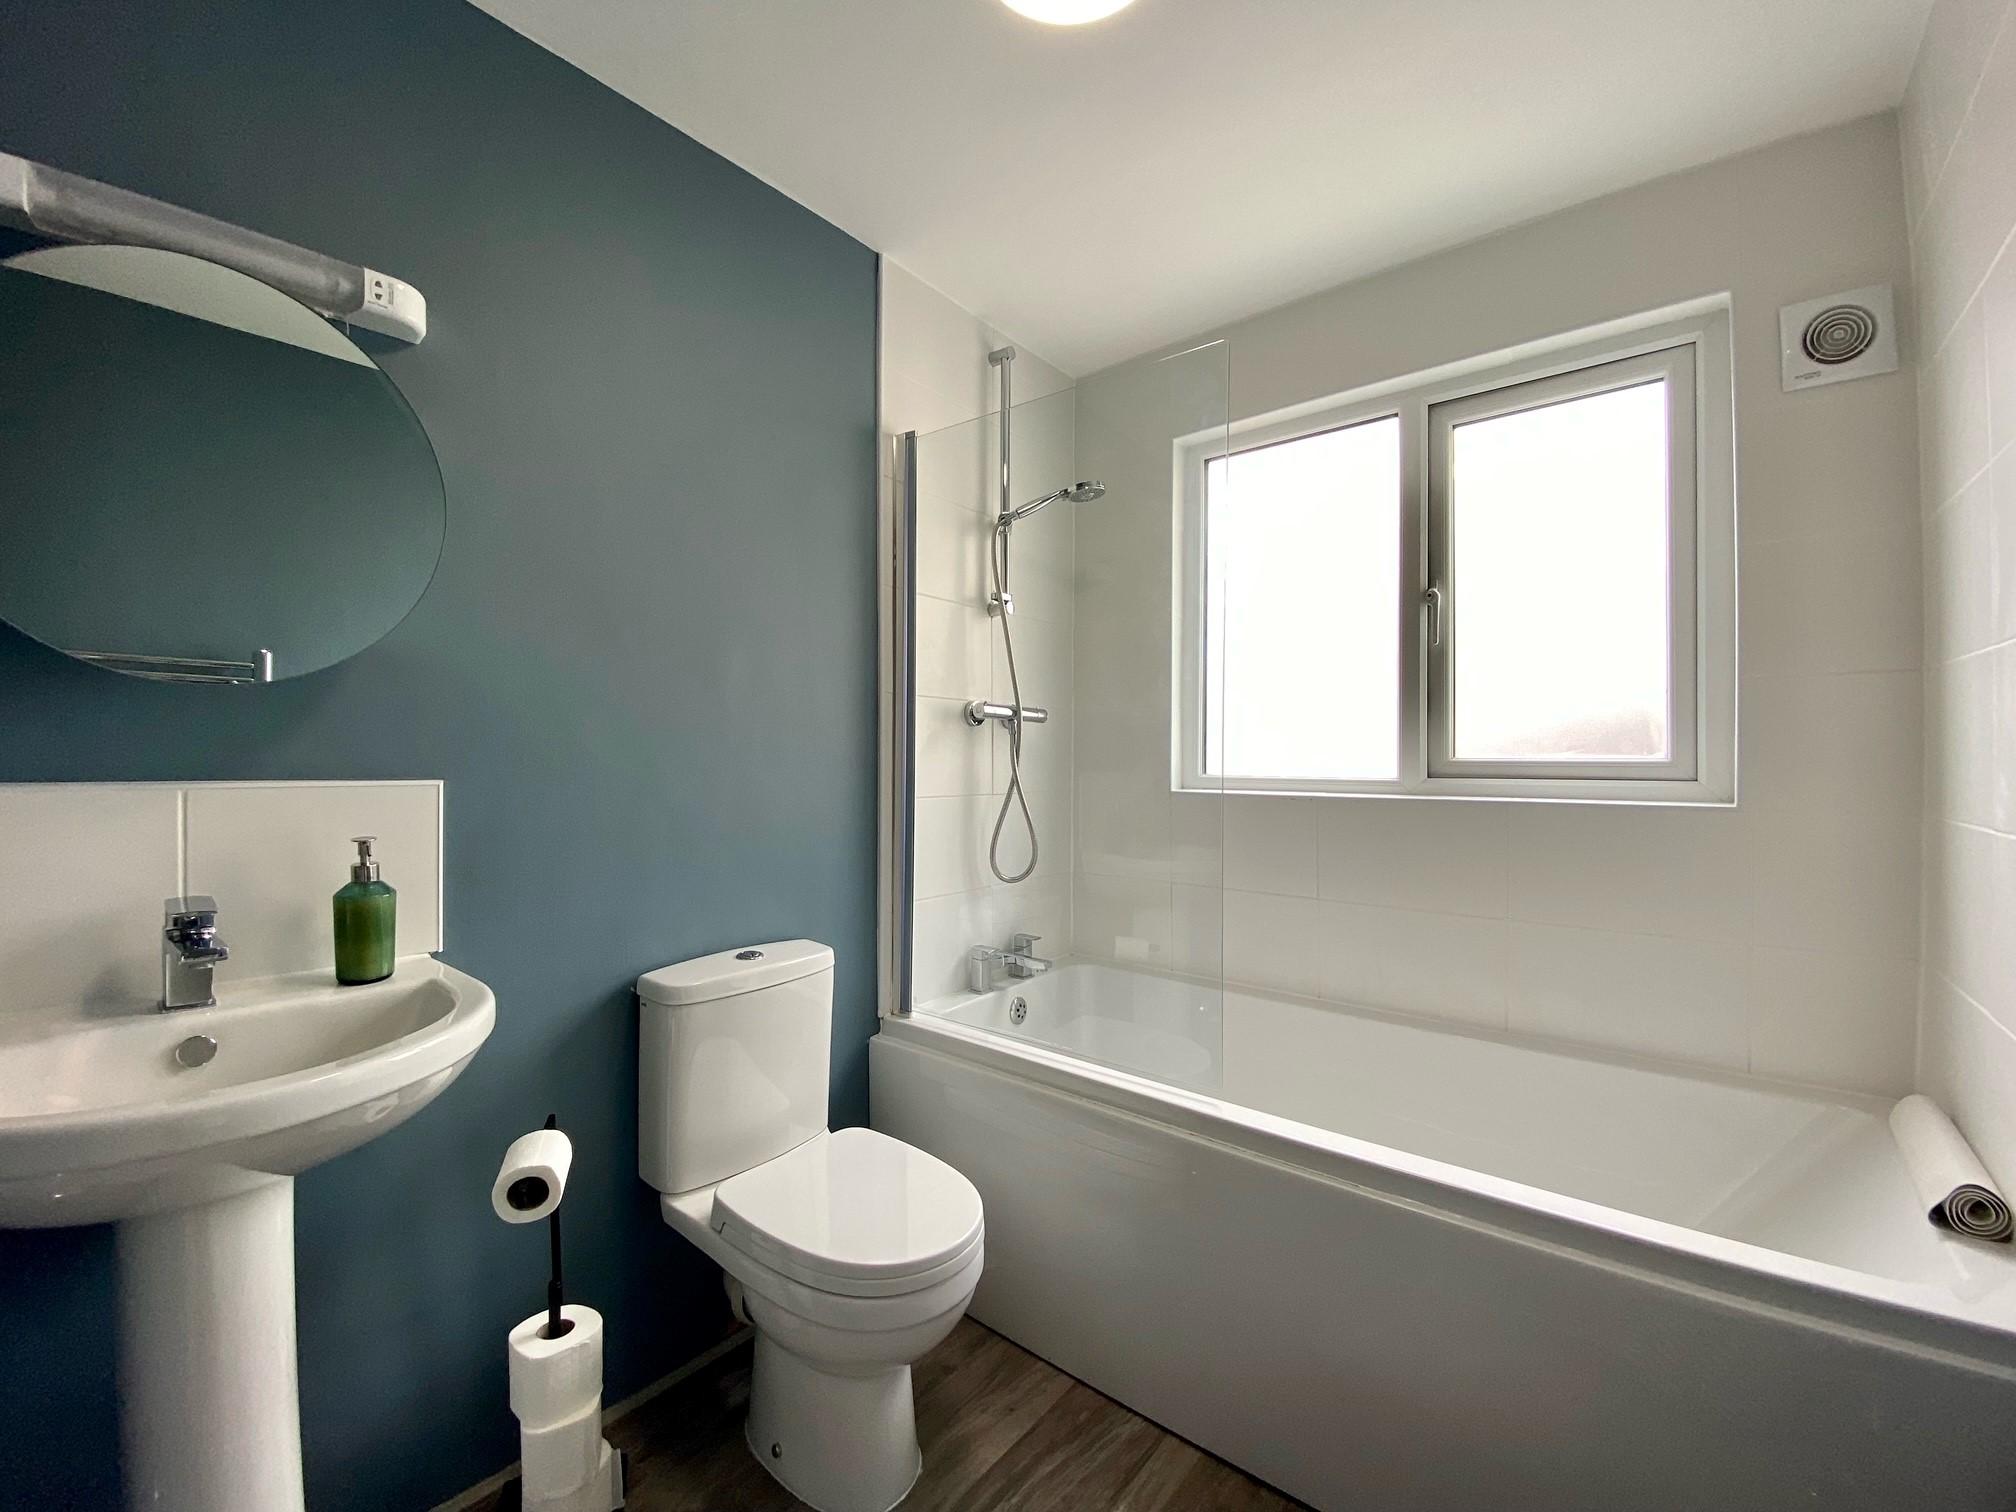 The View Bathroom